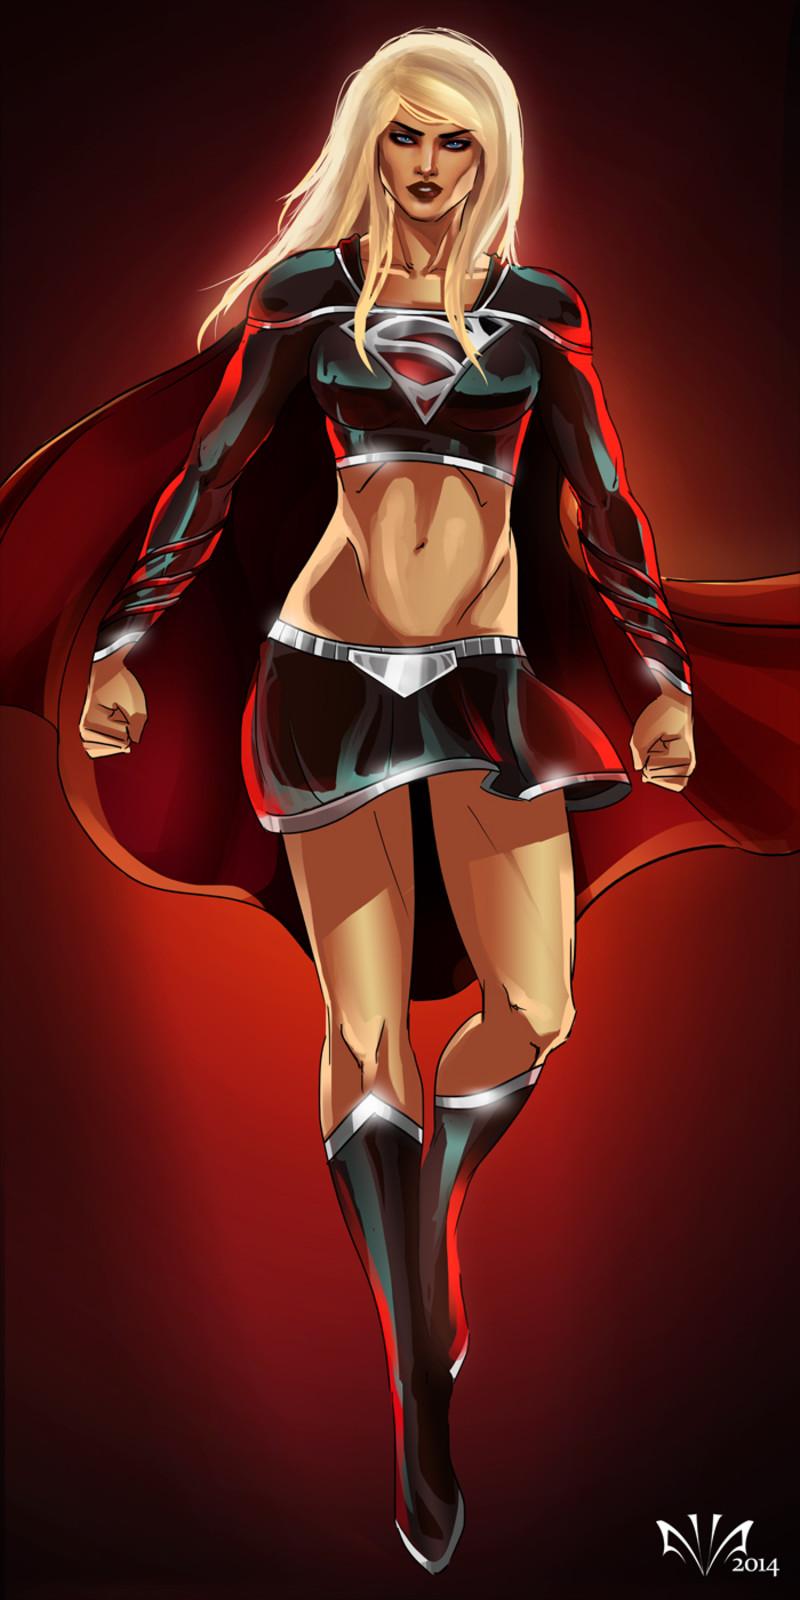 kartinki-supergerl